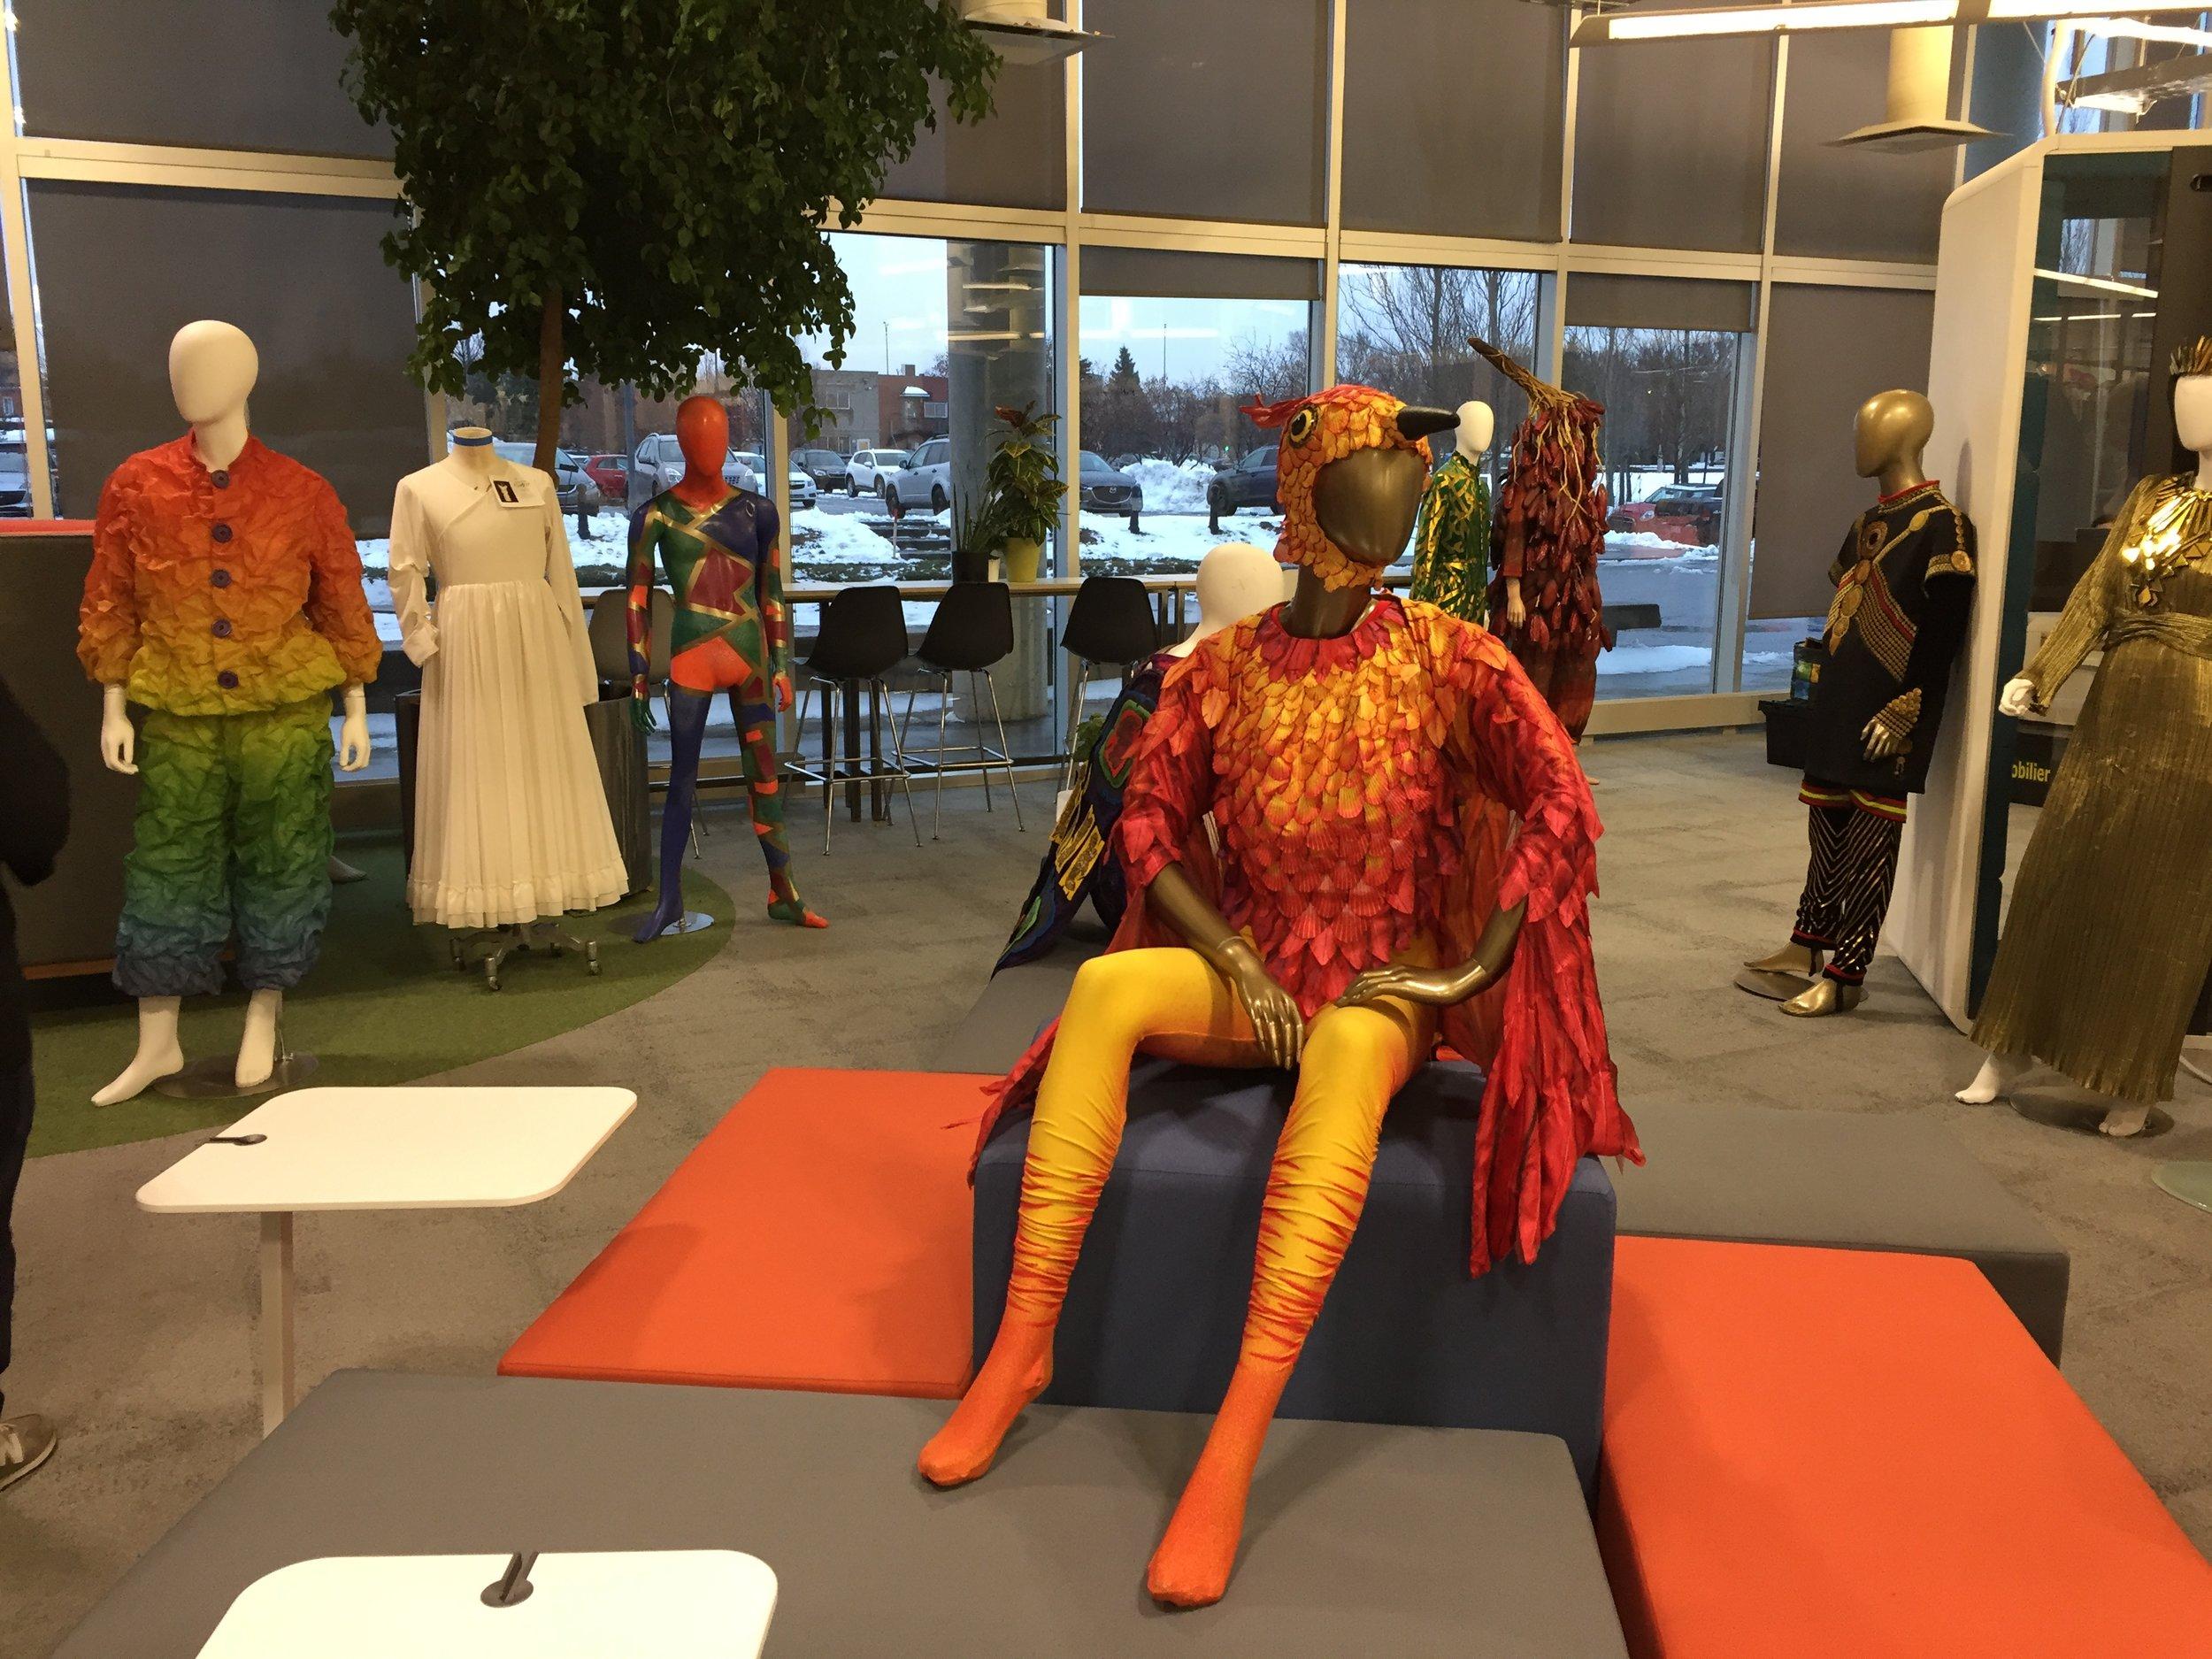 cirque du soleil costumes.JPG